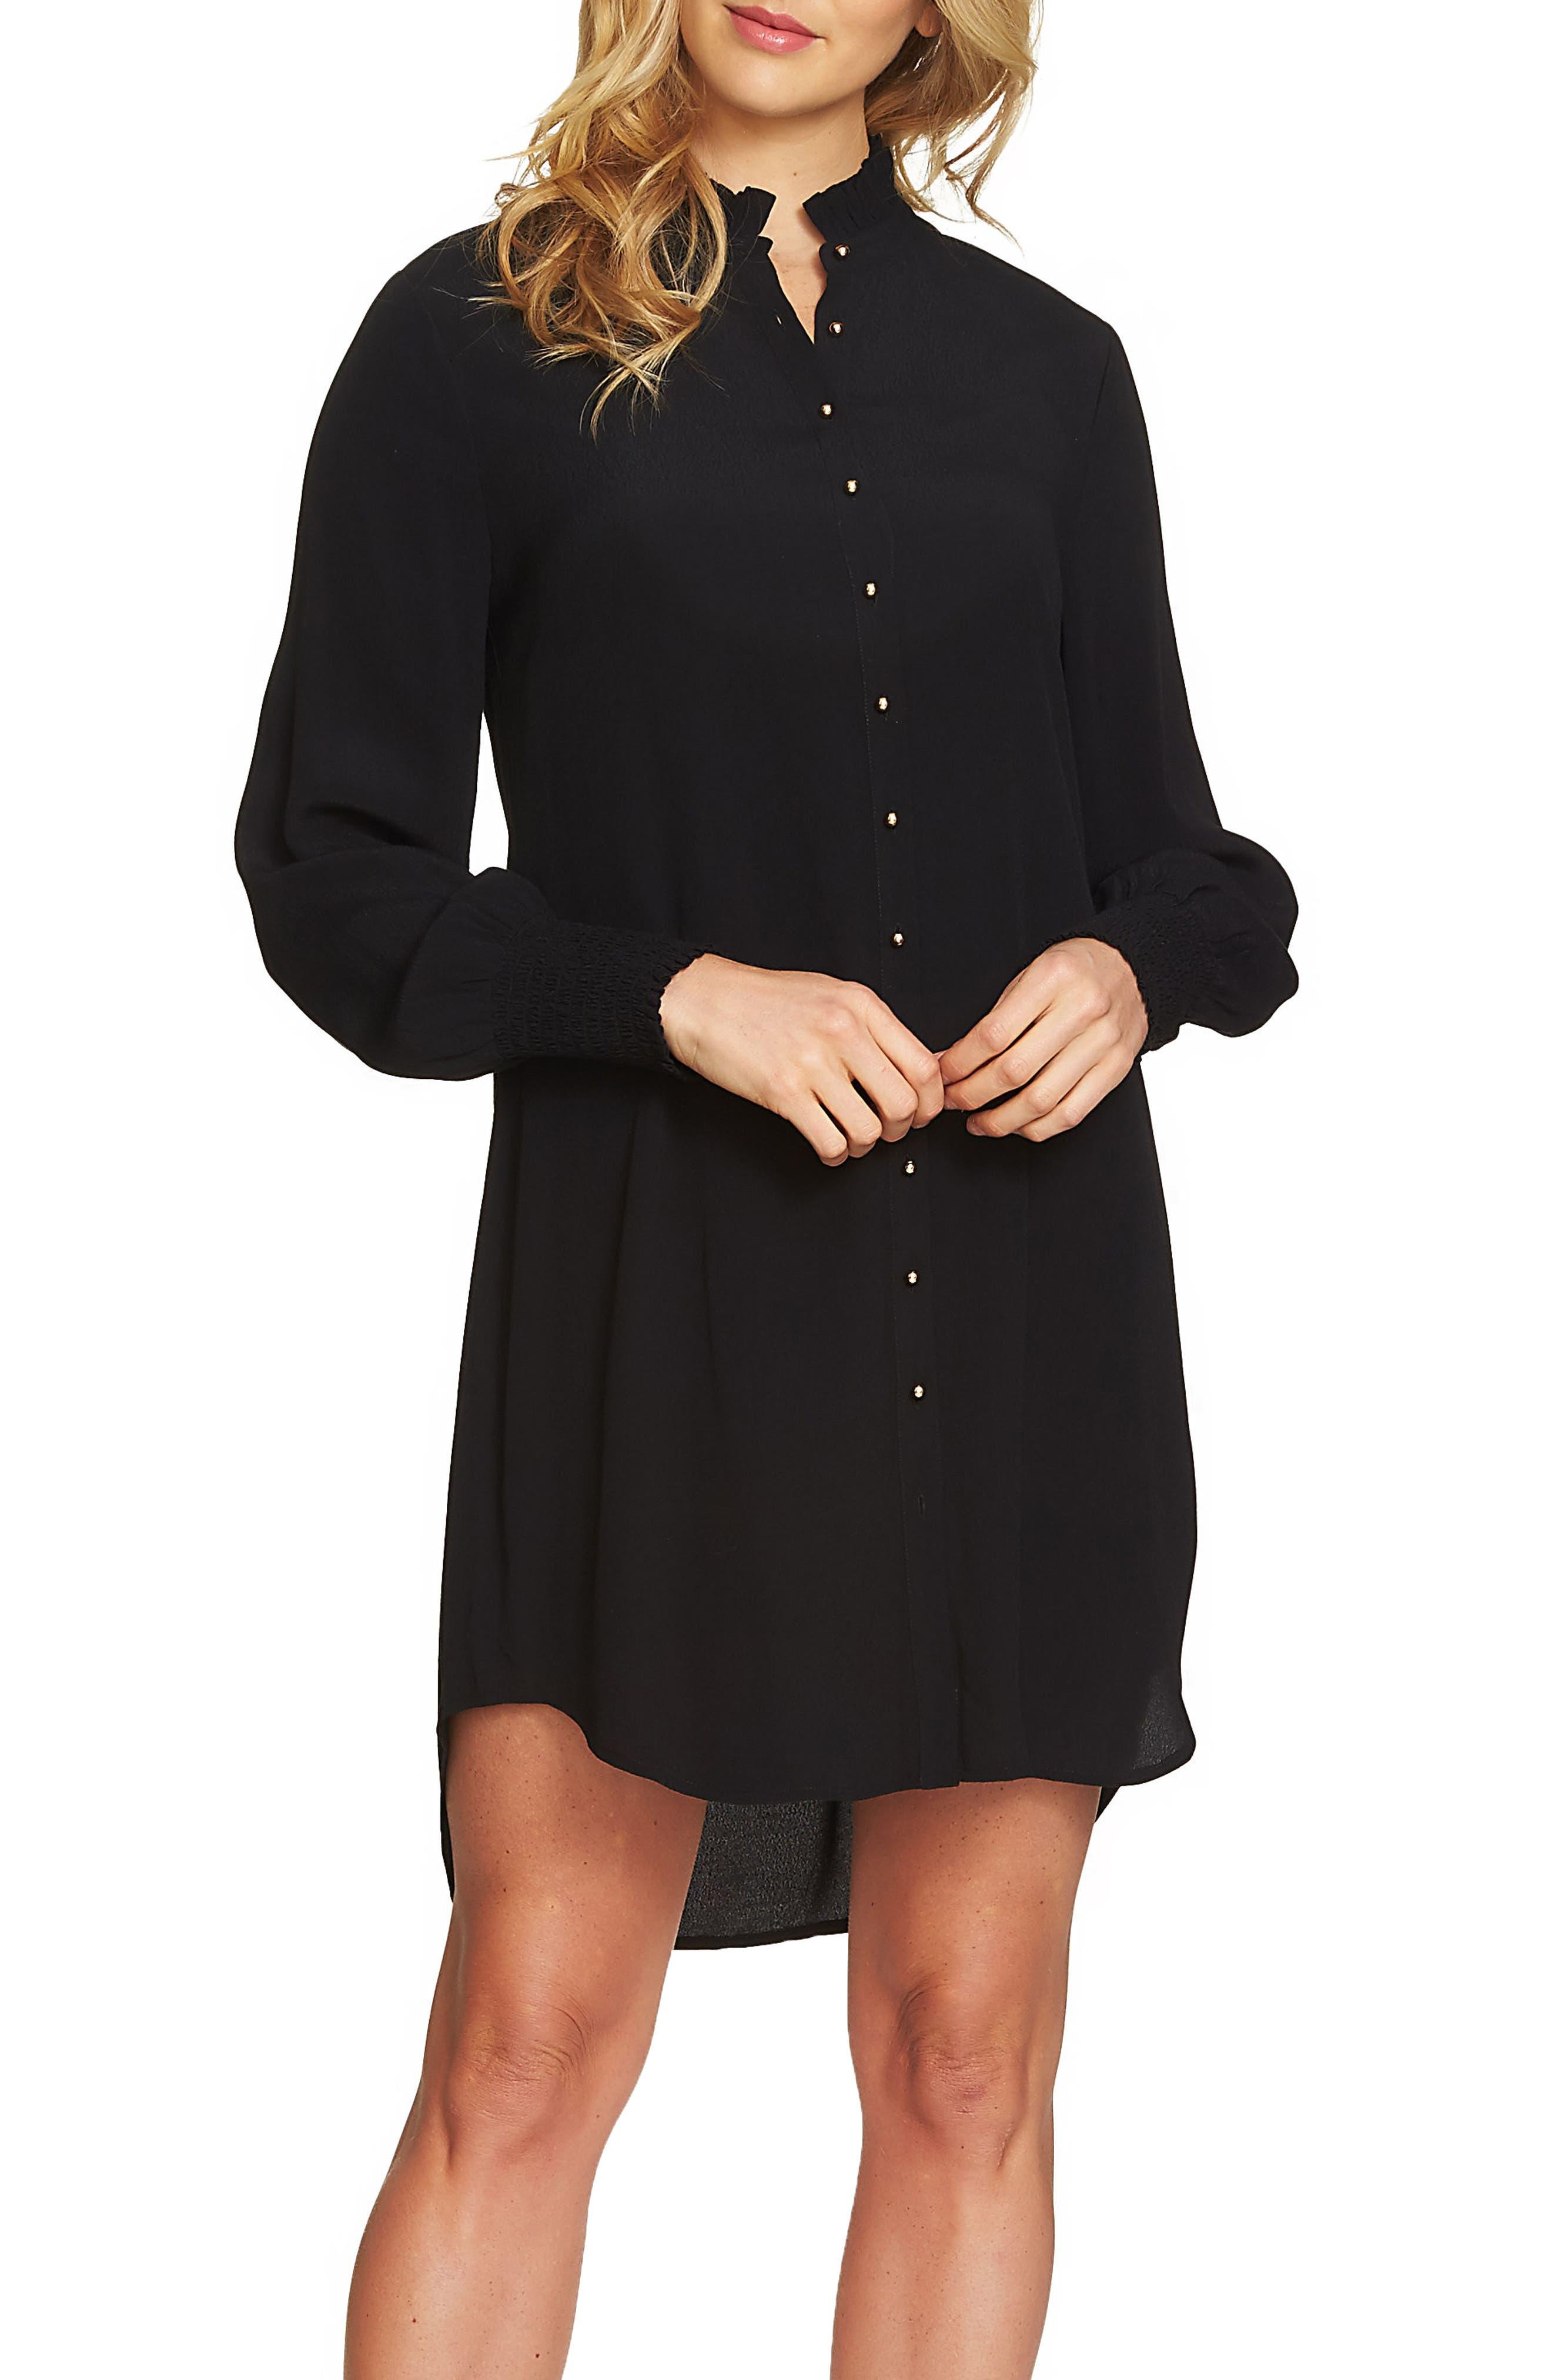 Main Image - 1.STATE Button Up Shirtdress